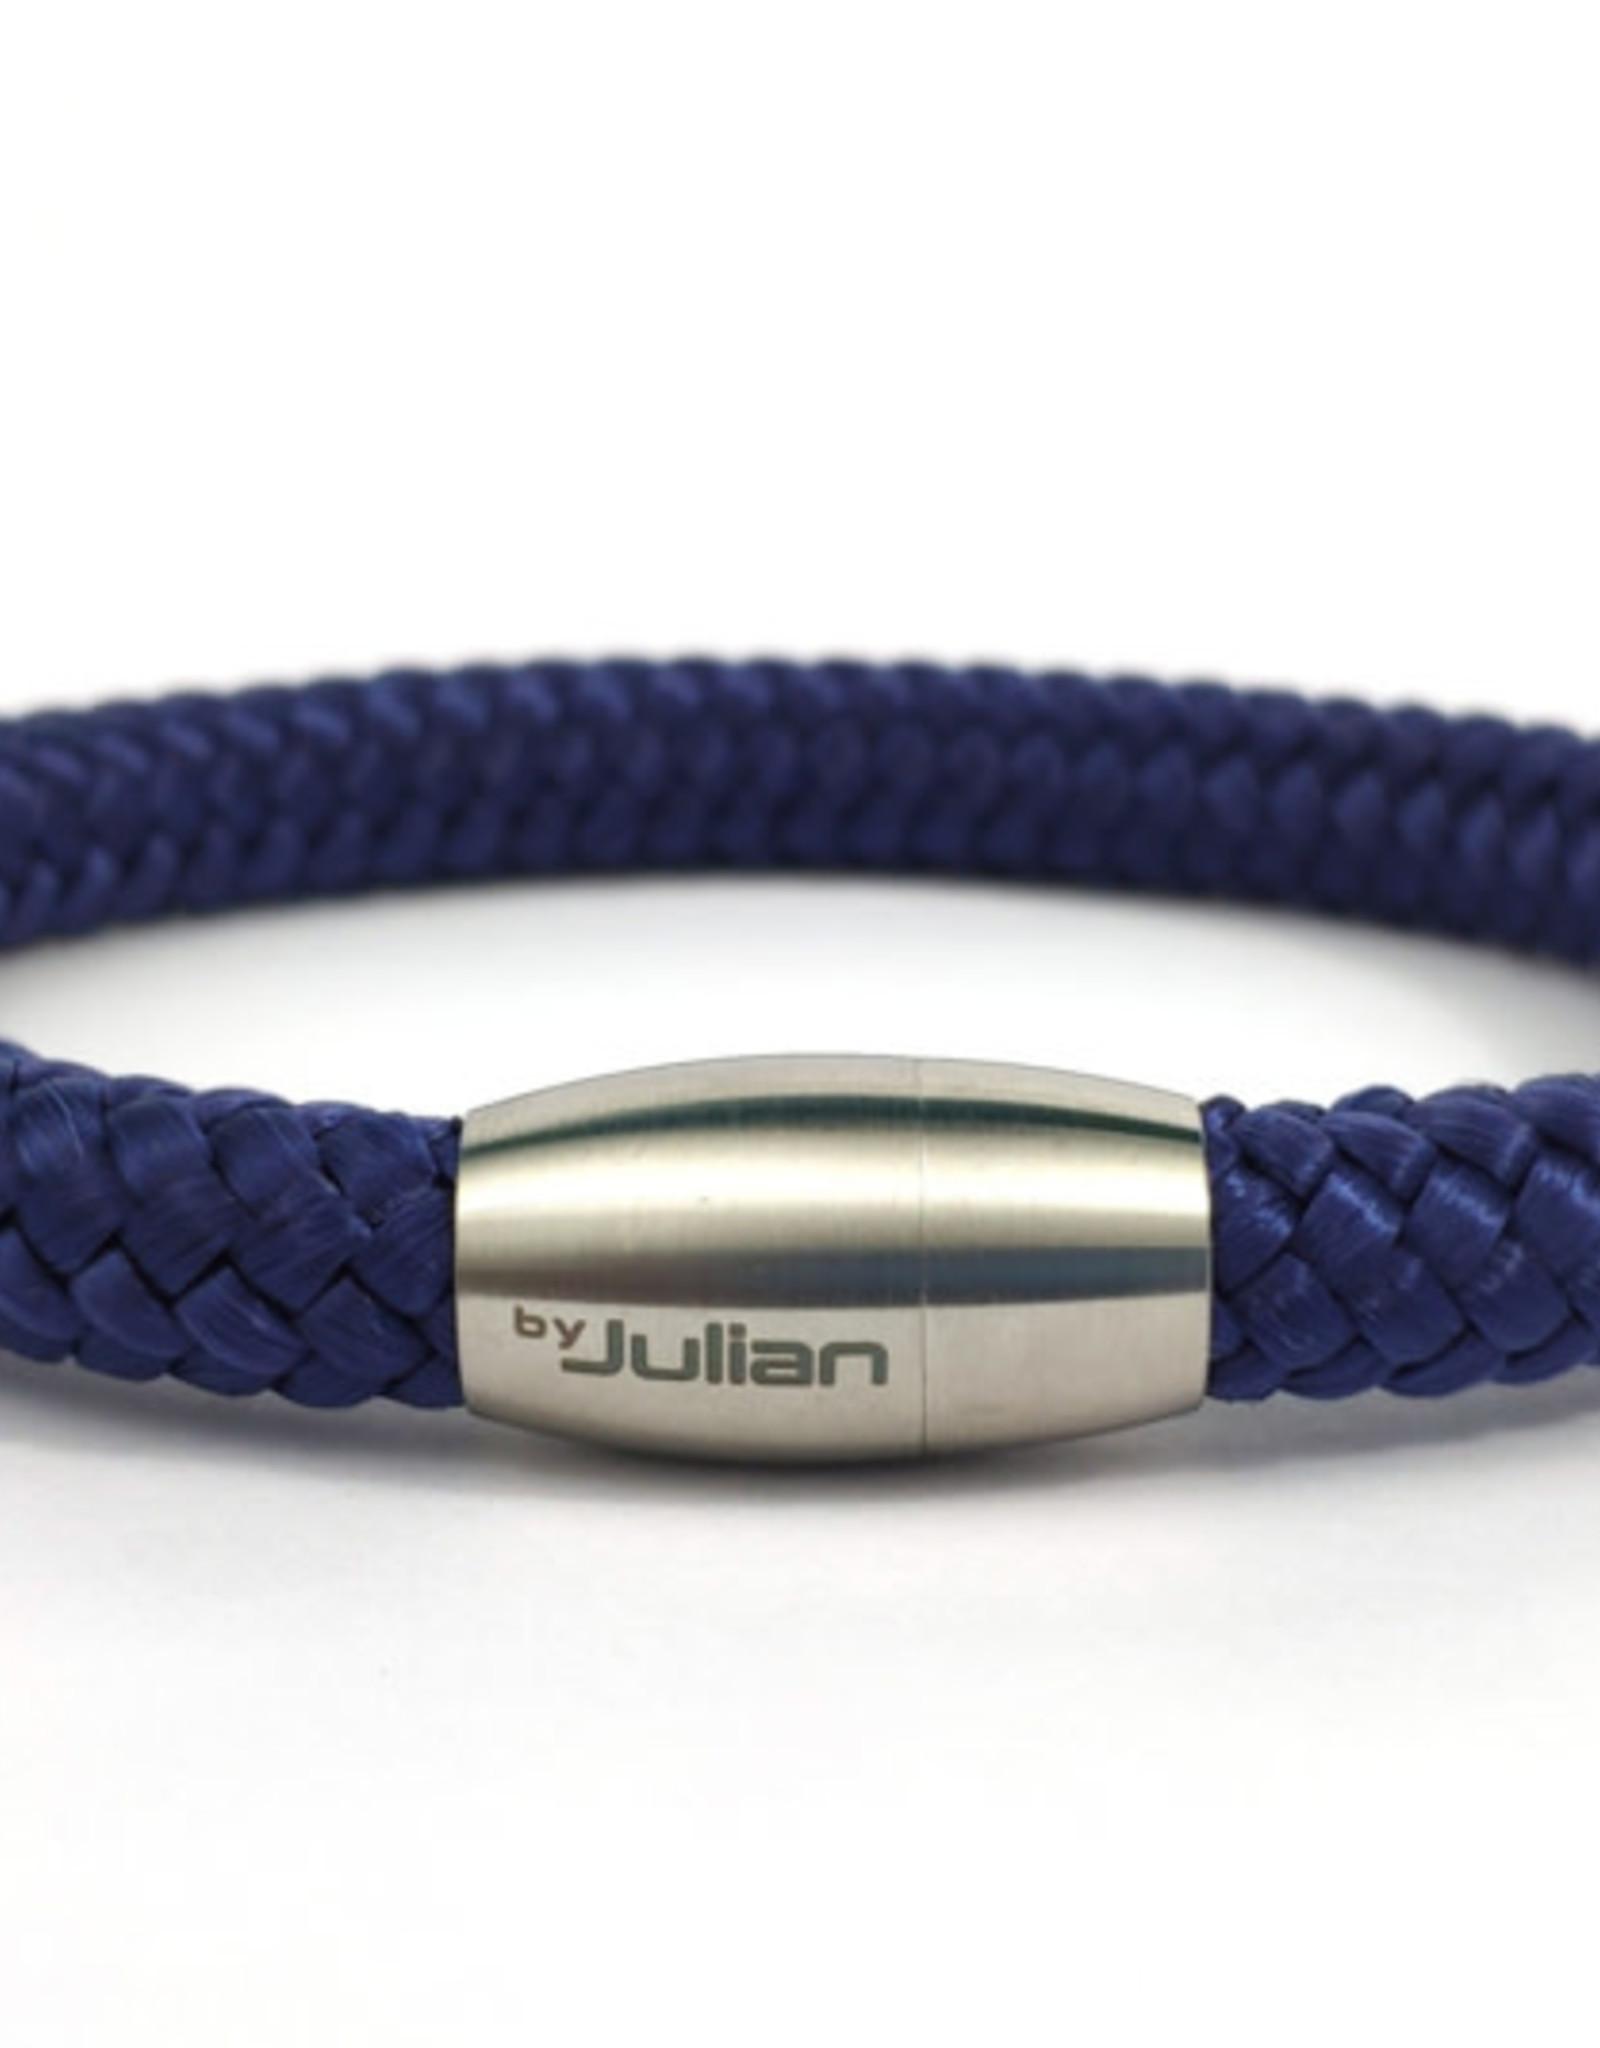 By Julian Lautan koord armband blauw